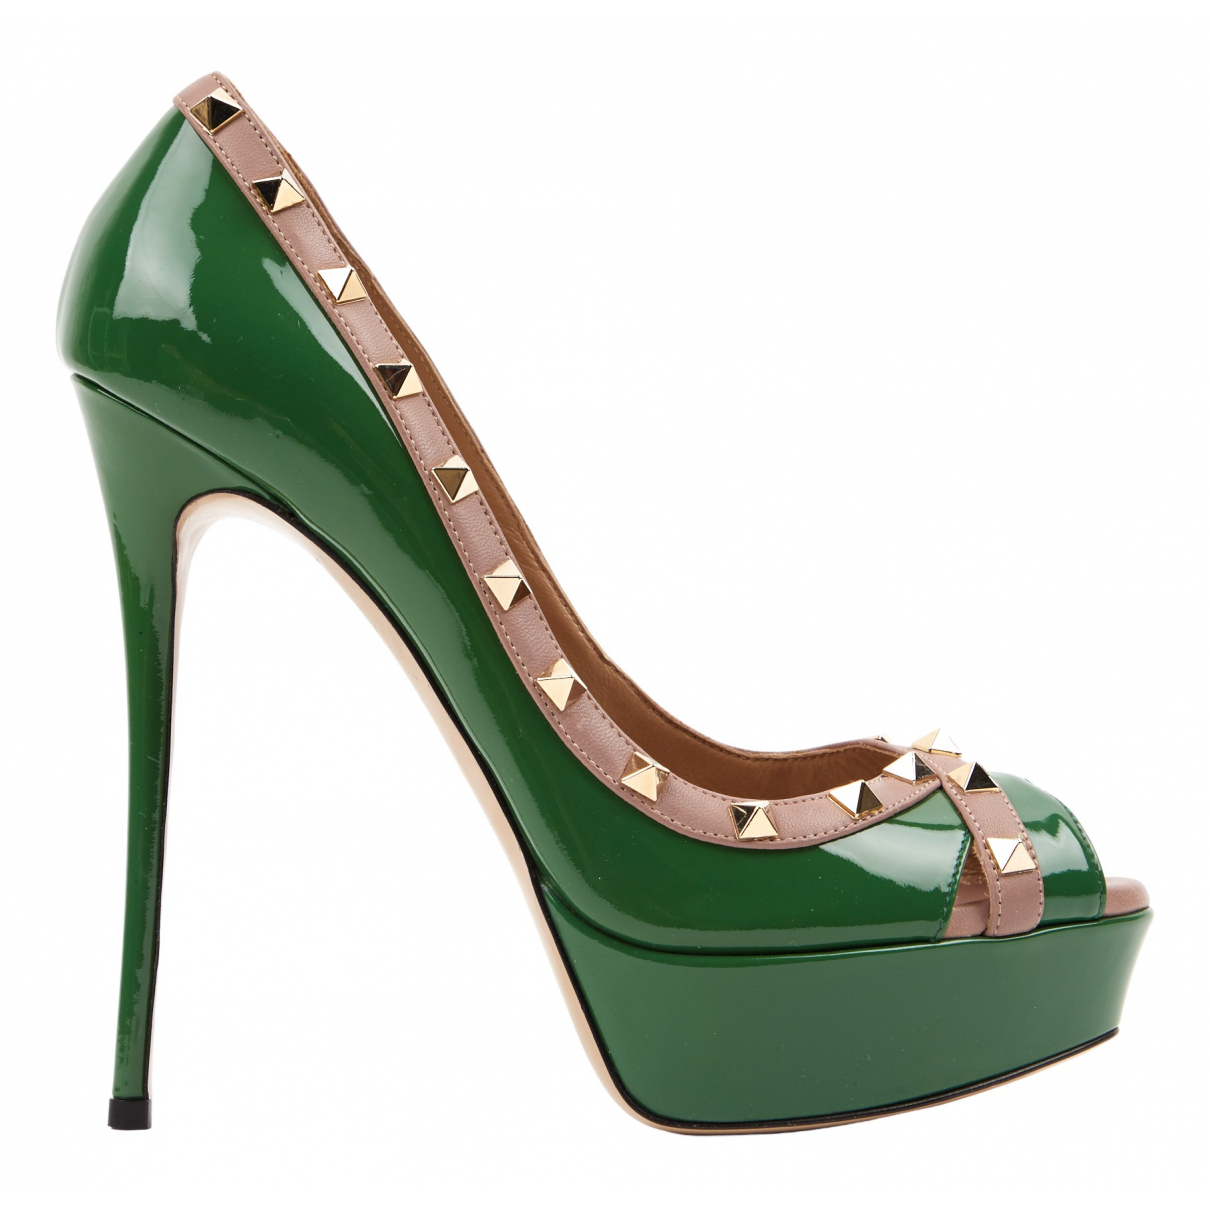 Valentino Garavani \N Green Patent leather Heels for Women 40 EU